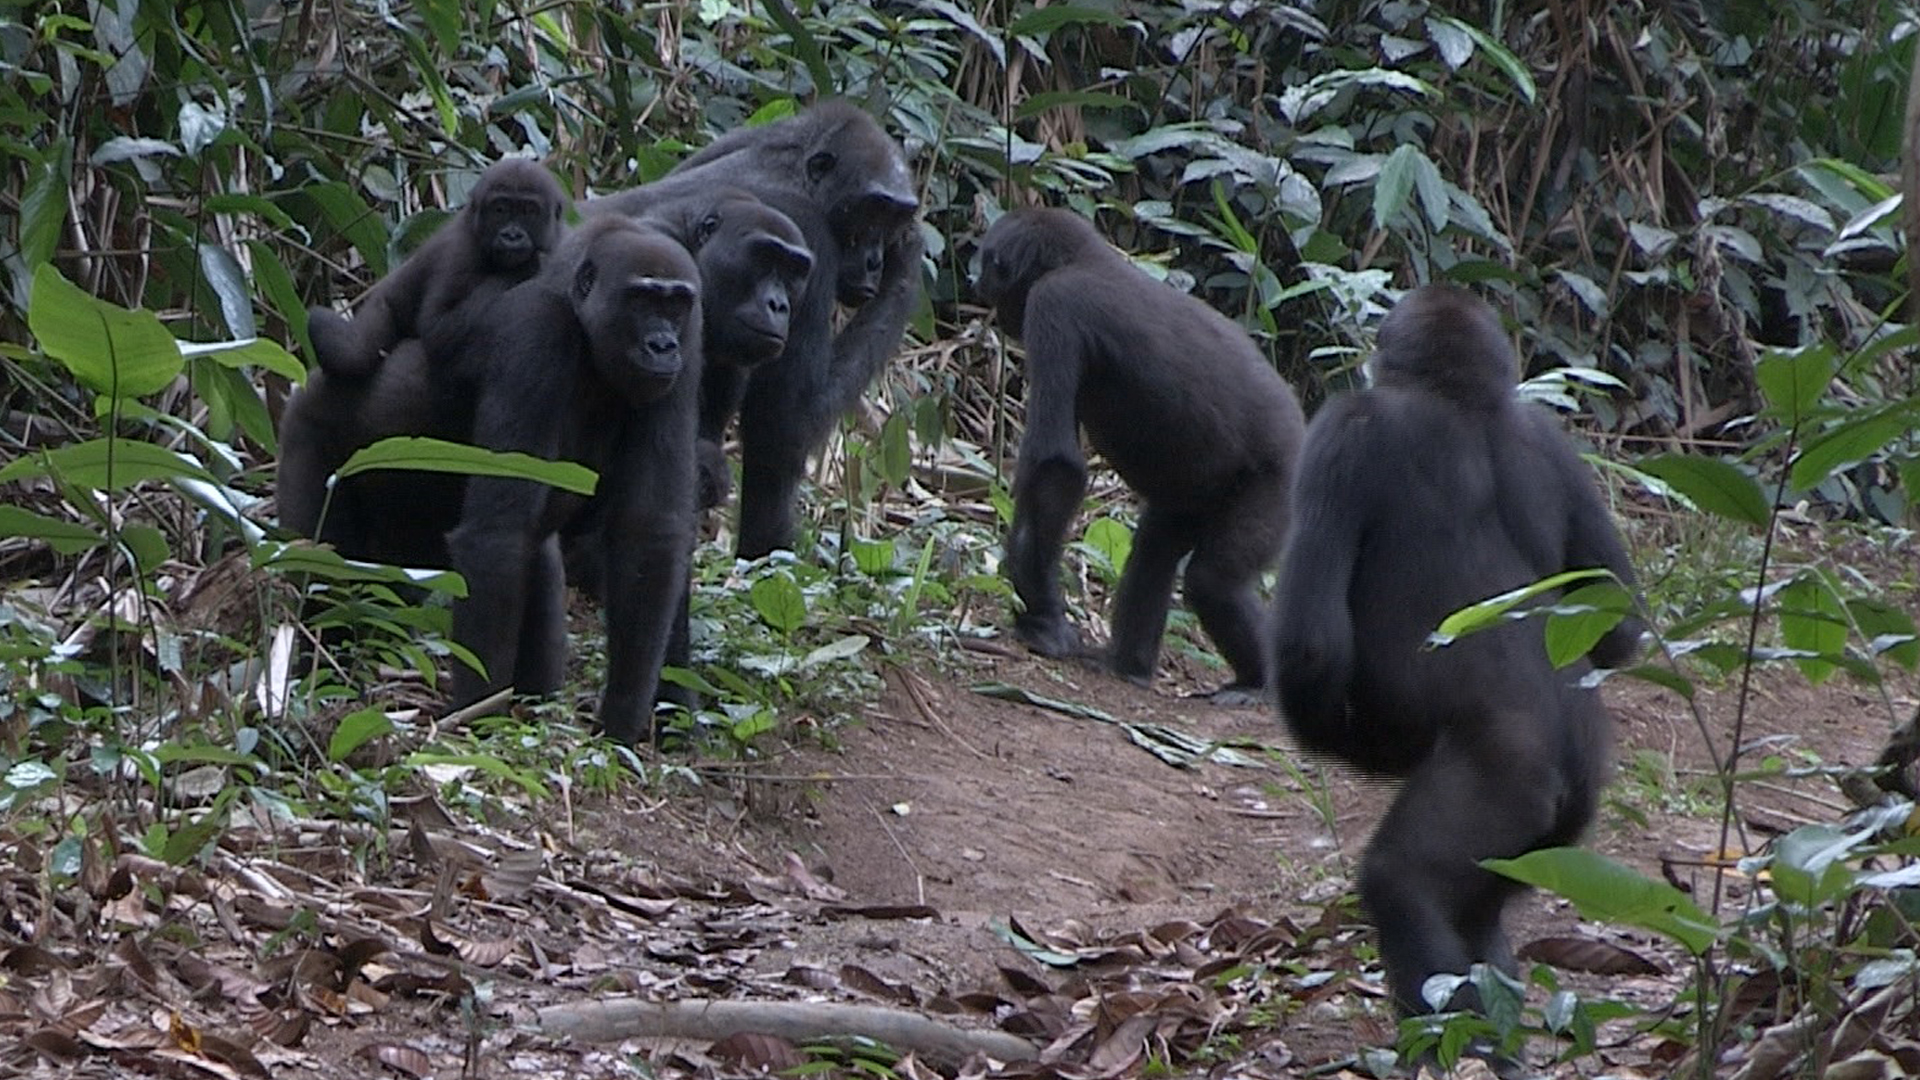 Un grupo familiar, en la selva de Ngaga. Imagen: German Illera / CSIC